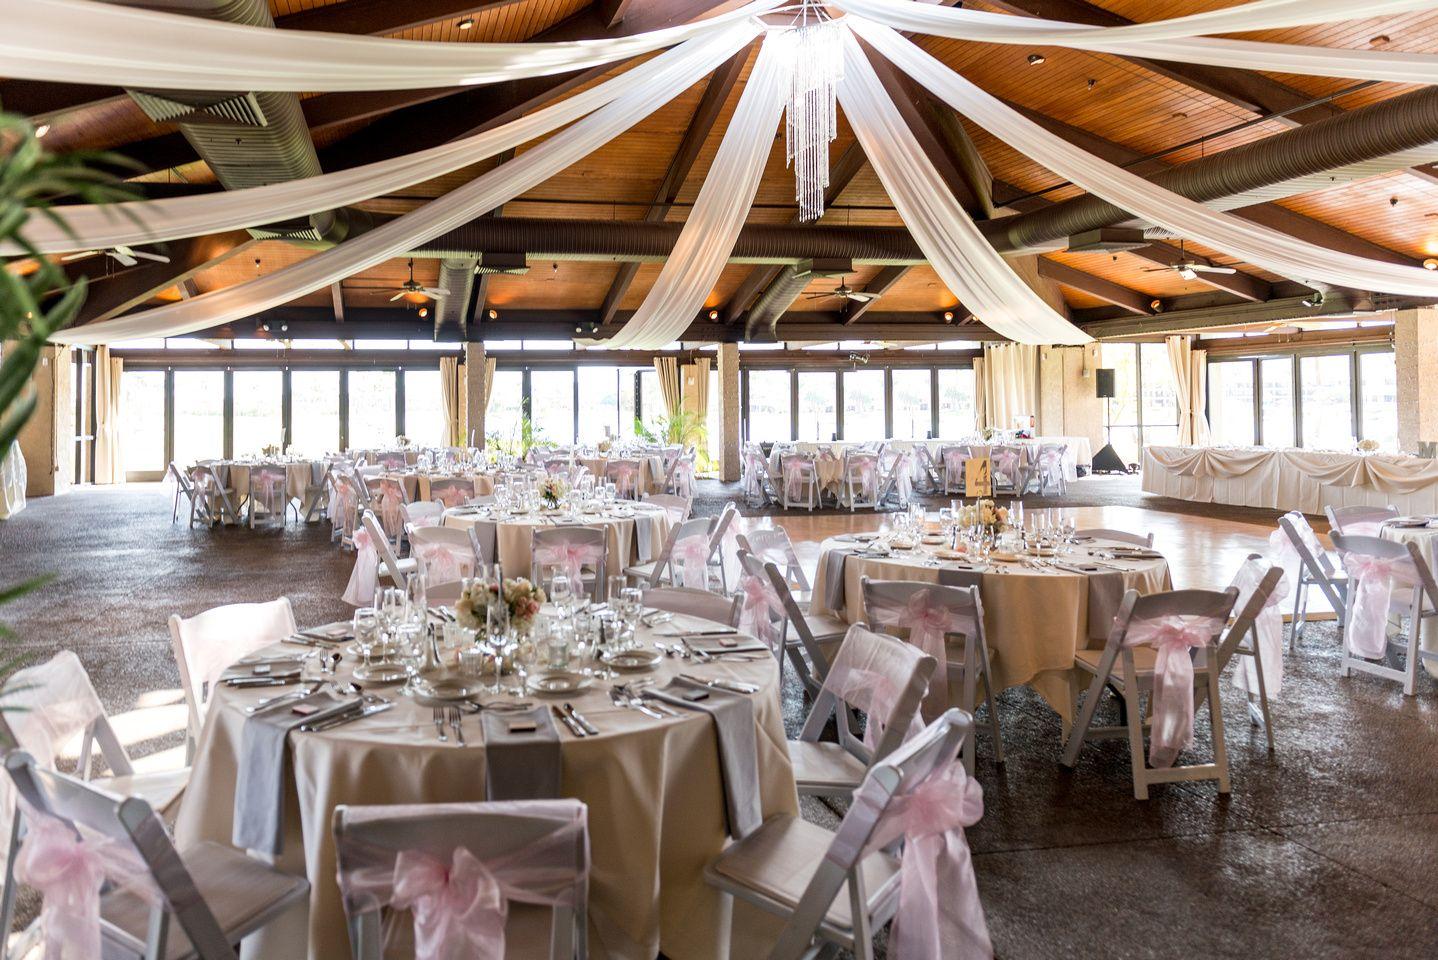 One Of Our Light Summer Weddings Venue Mccormick Ranch Golf Club Scottsdale Arizona Photographer Foskett Creative Florist Cactus Flowers